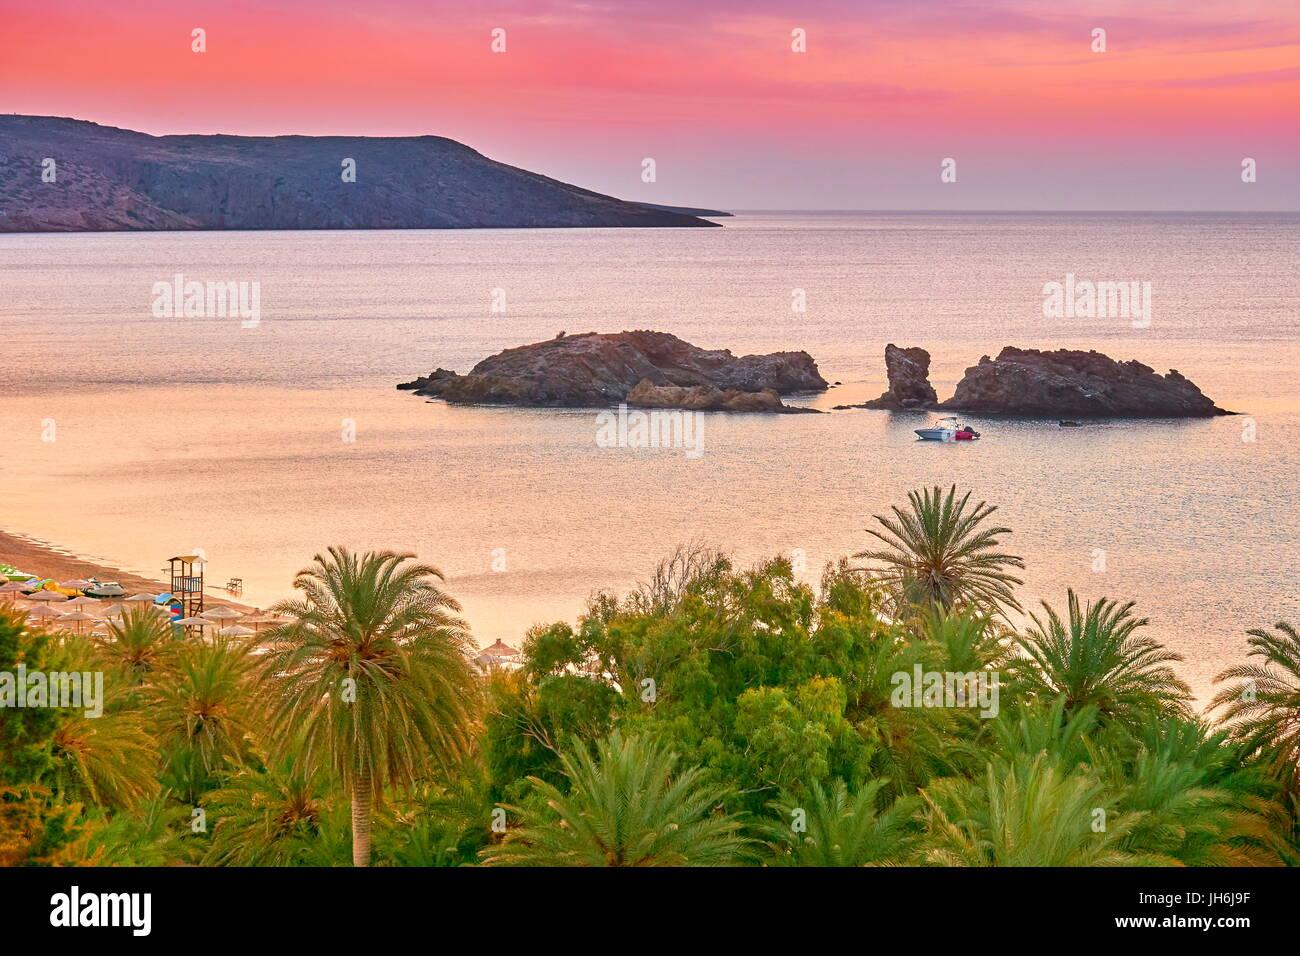 Crete Island- Vai Beach before sunrise, Greece - Stock Image